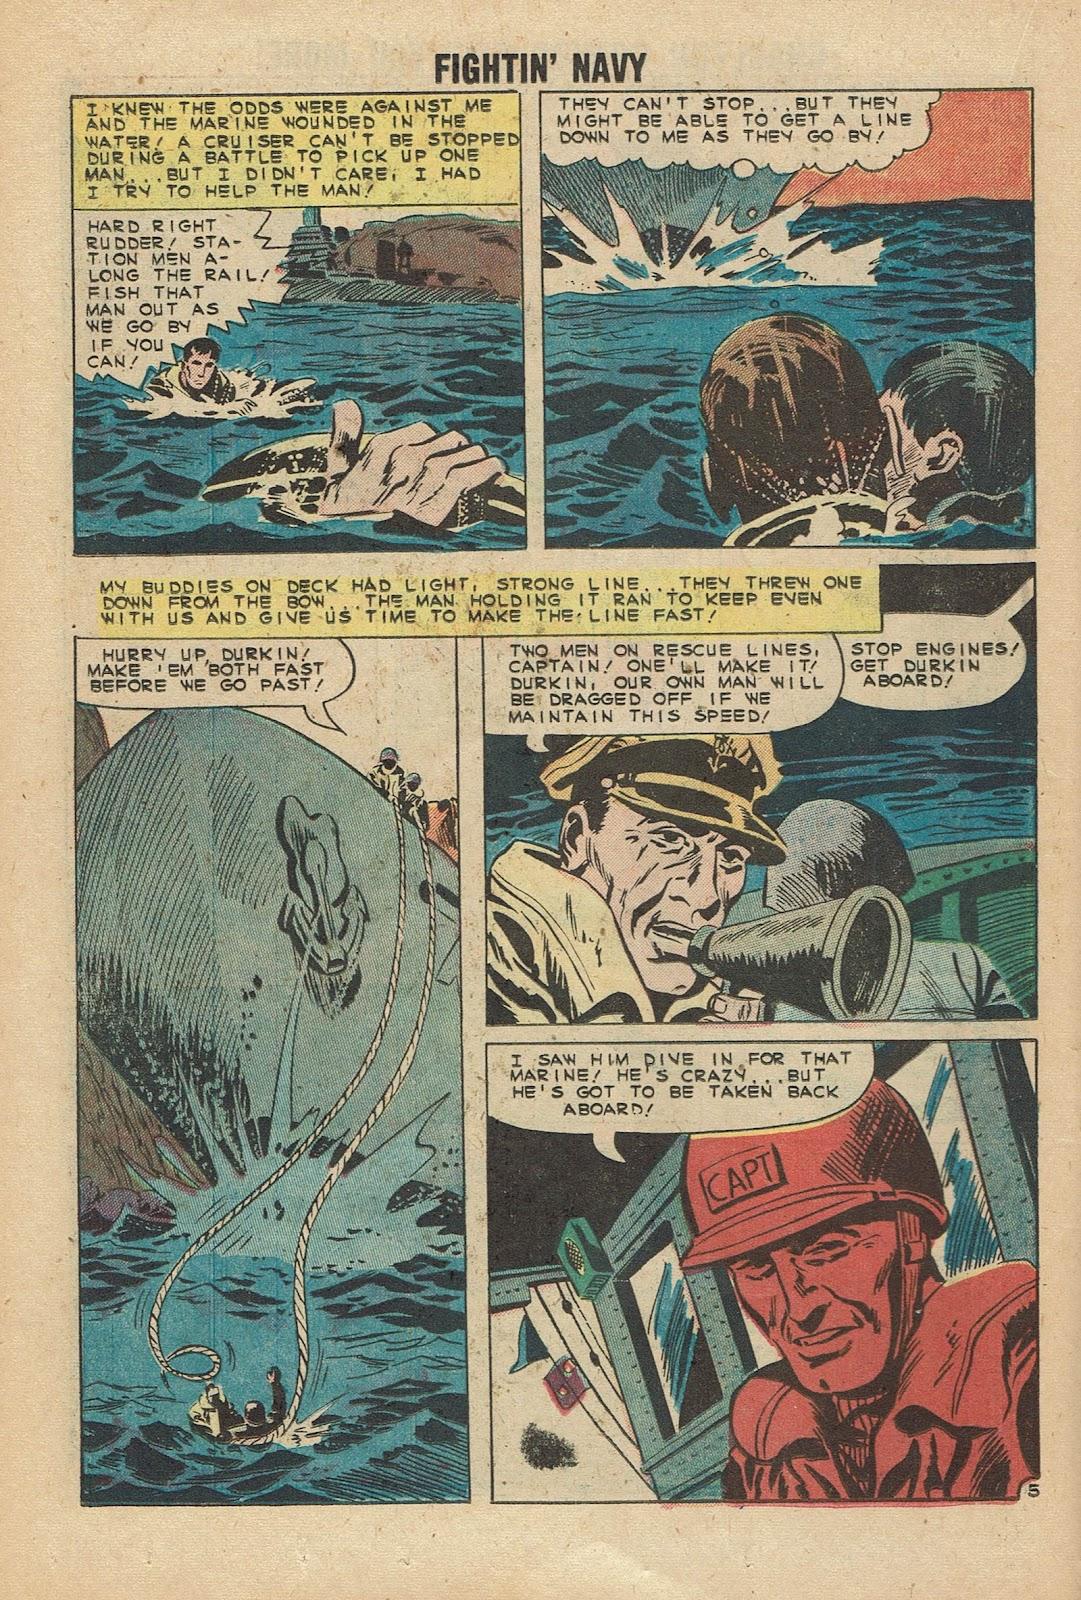 Read online Fightin' Navy comic -  Issue #96 - 18